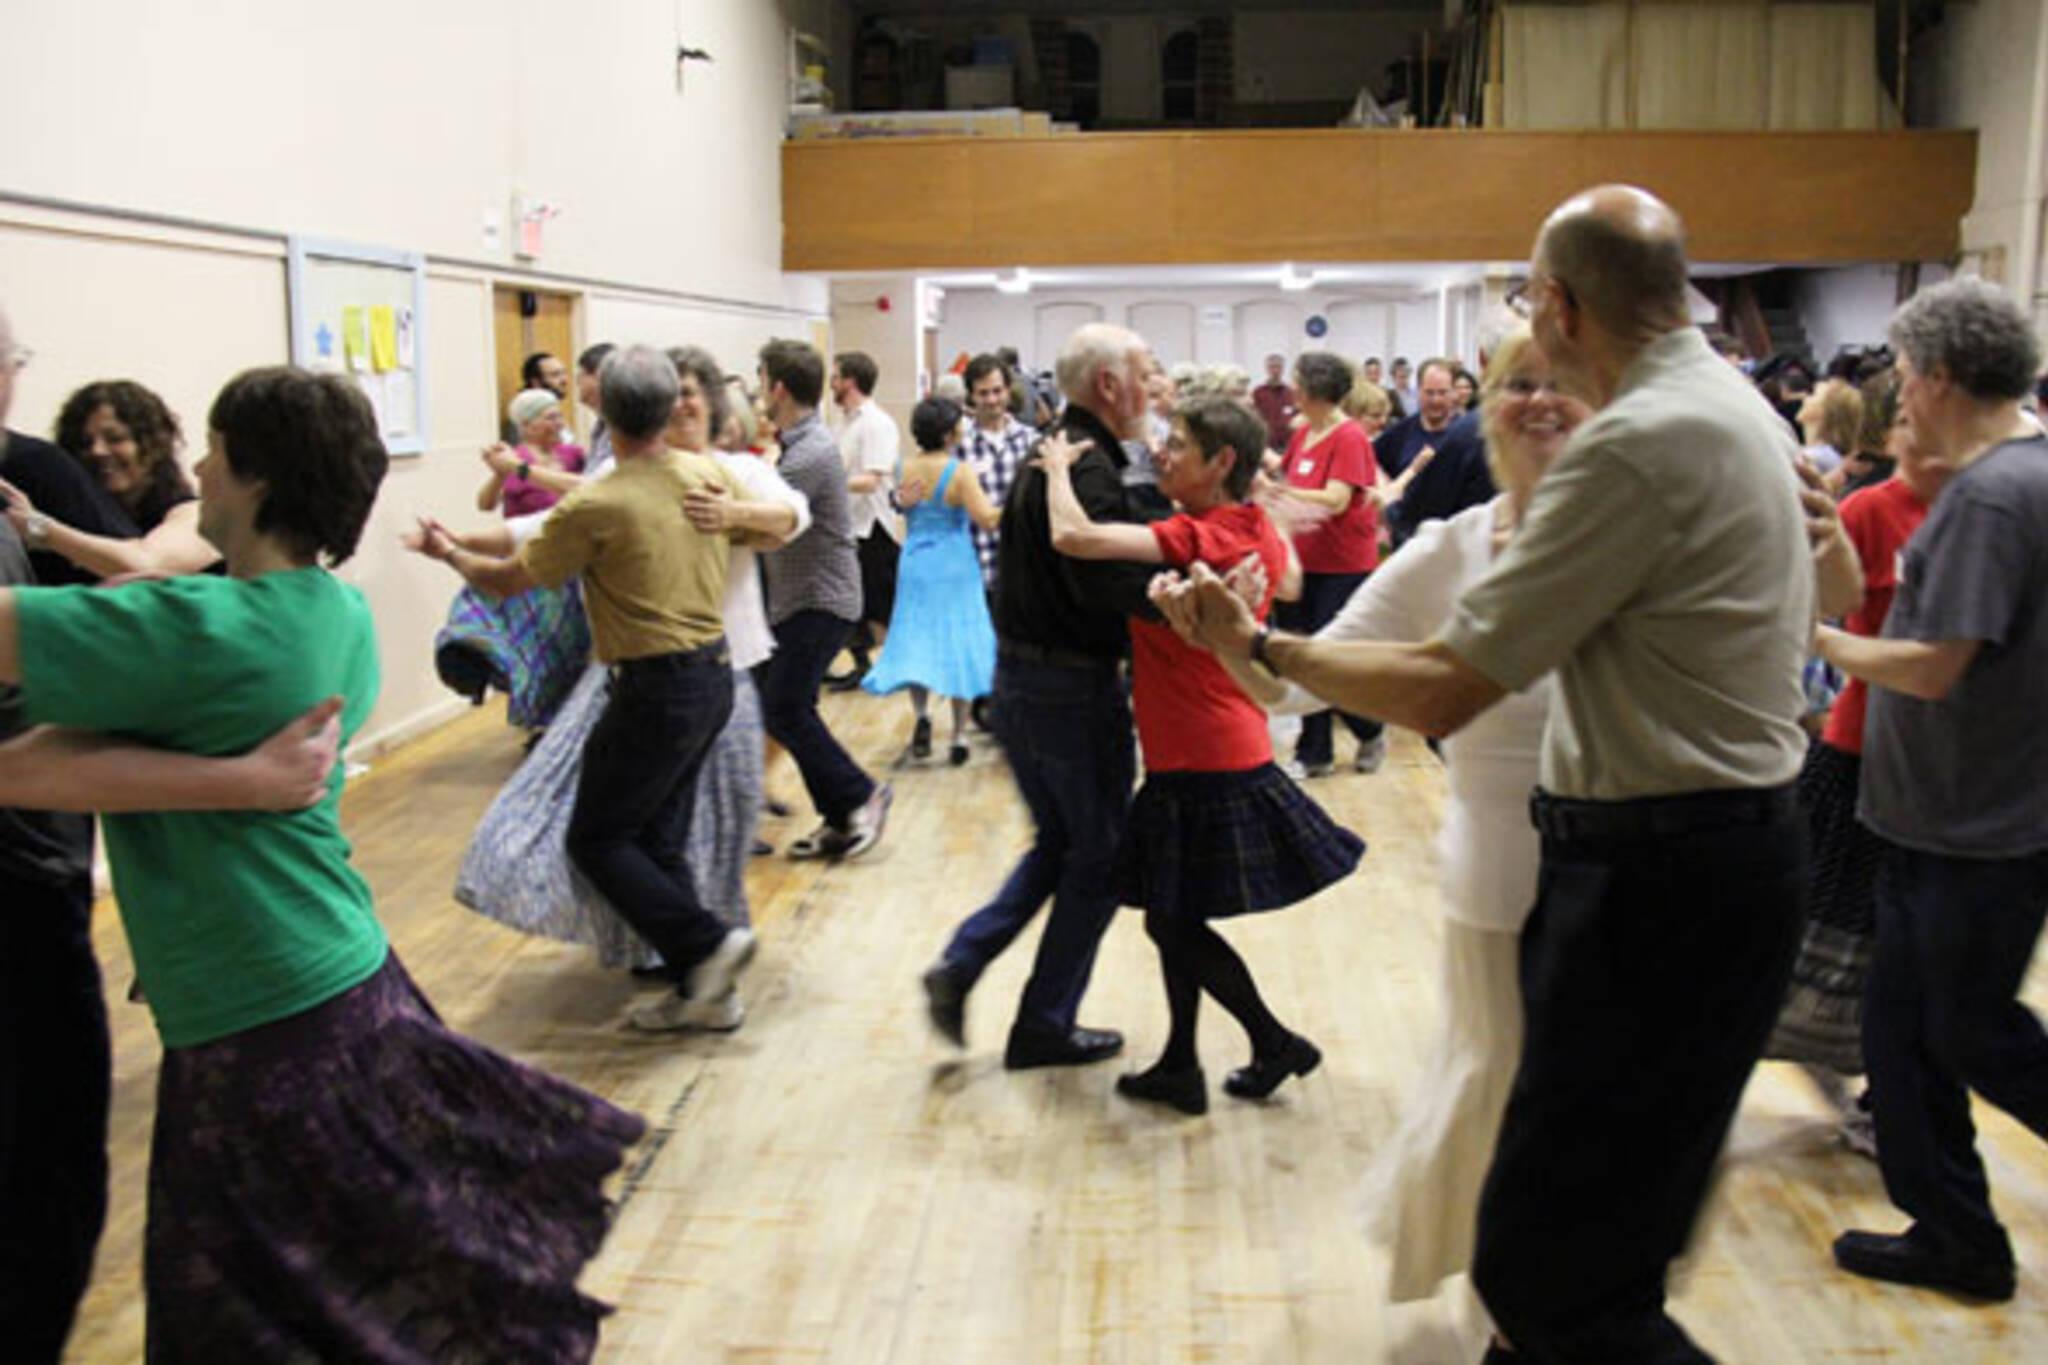 Contra Dancing Toronto